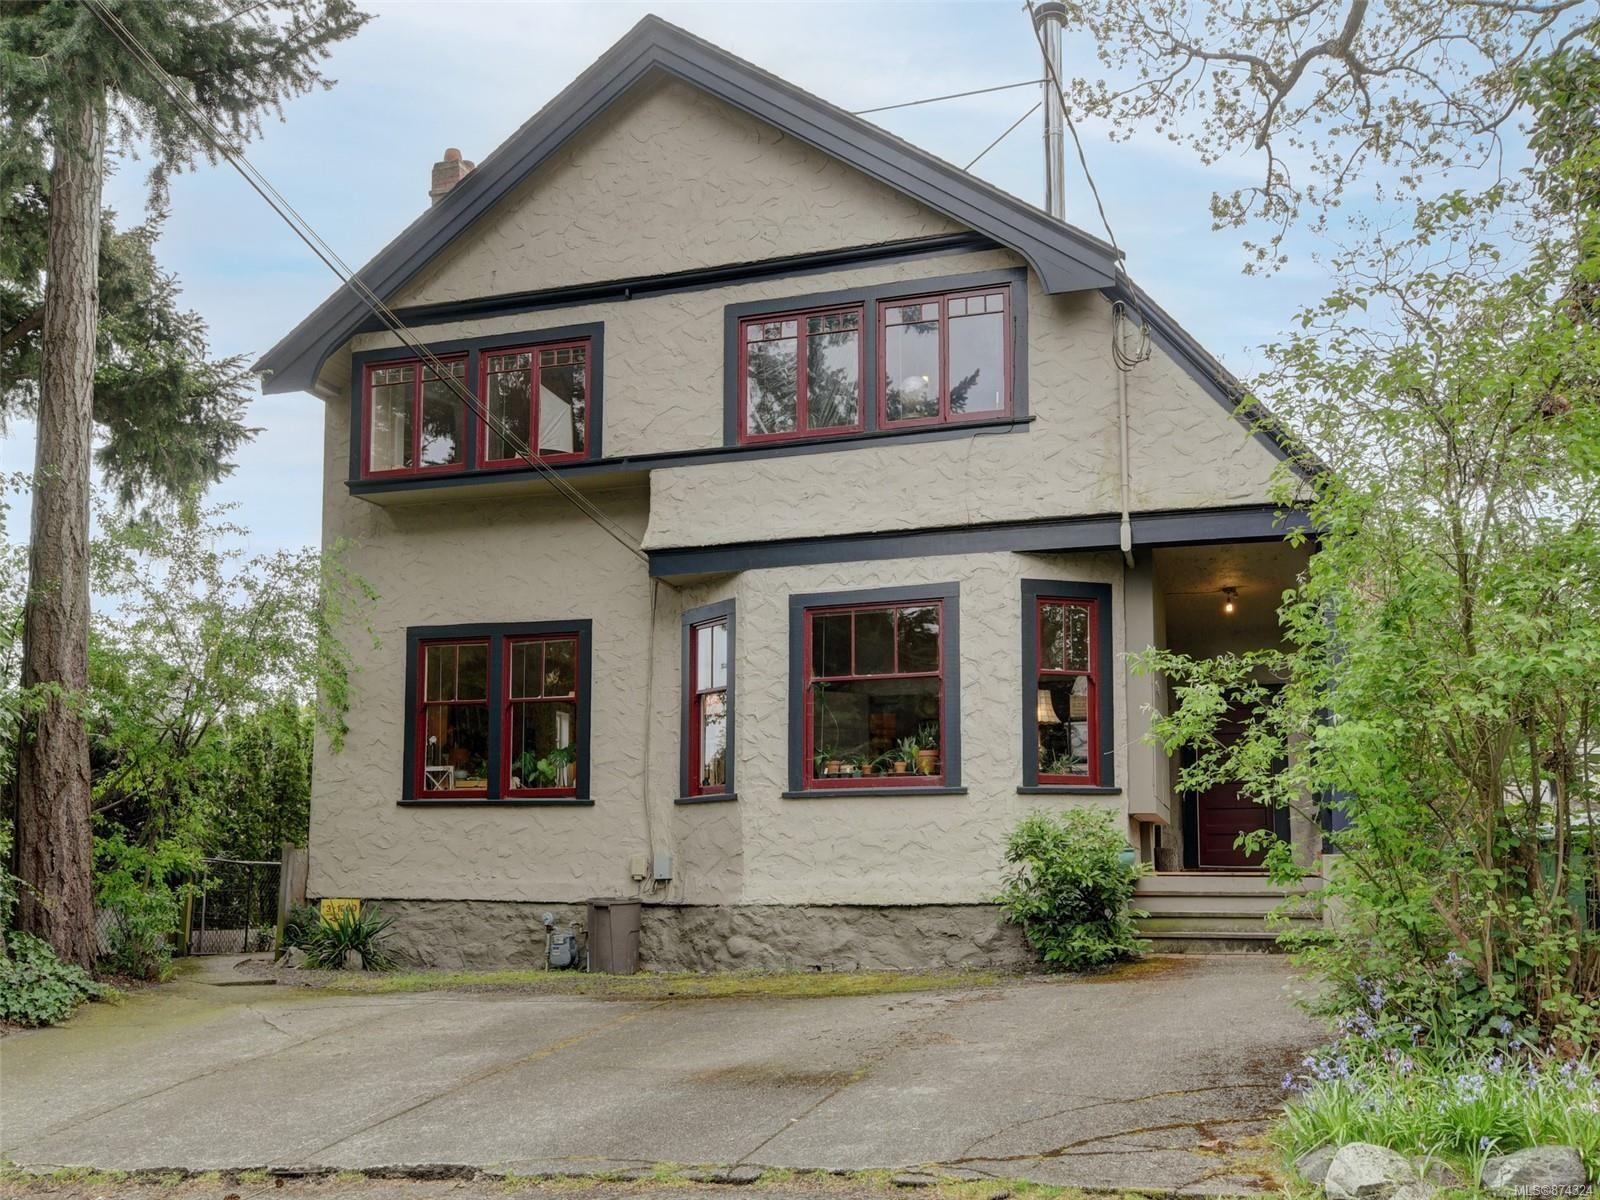 Main Photo: 1000 Carberry Gdns in : Vi Rockland Full Duplex for sale (Victoria)  : MLS®# 874324